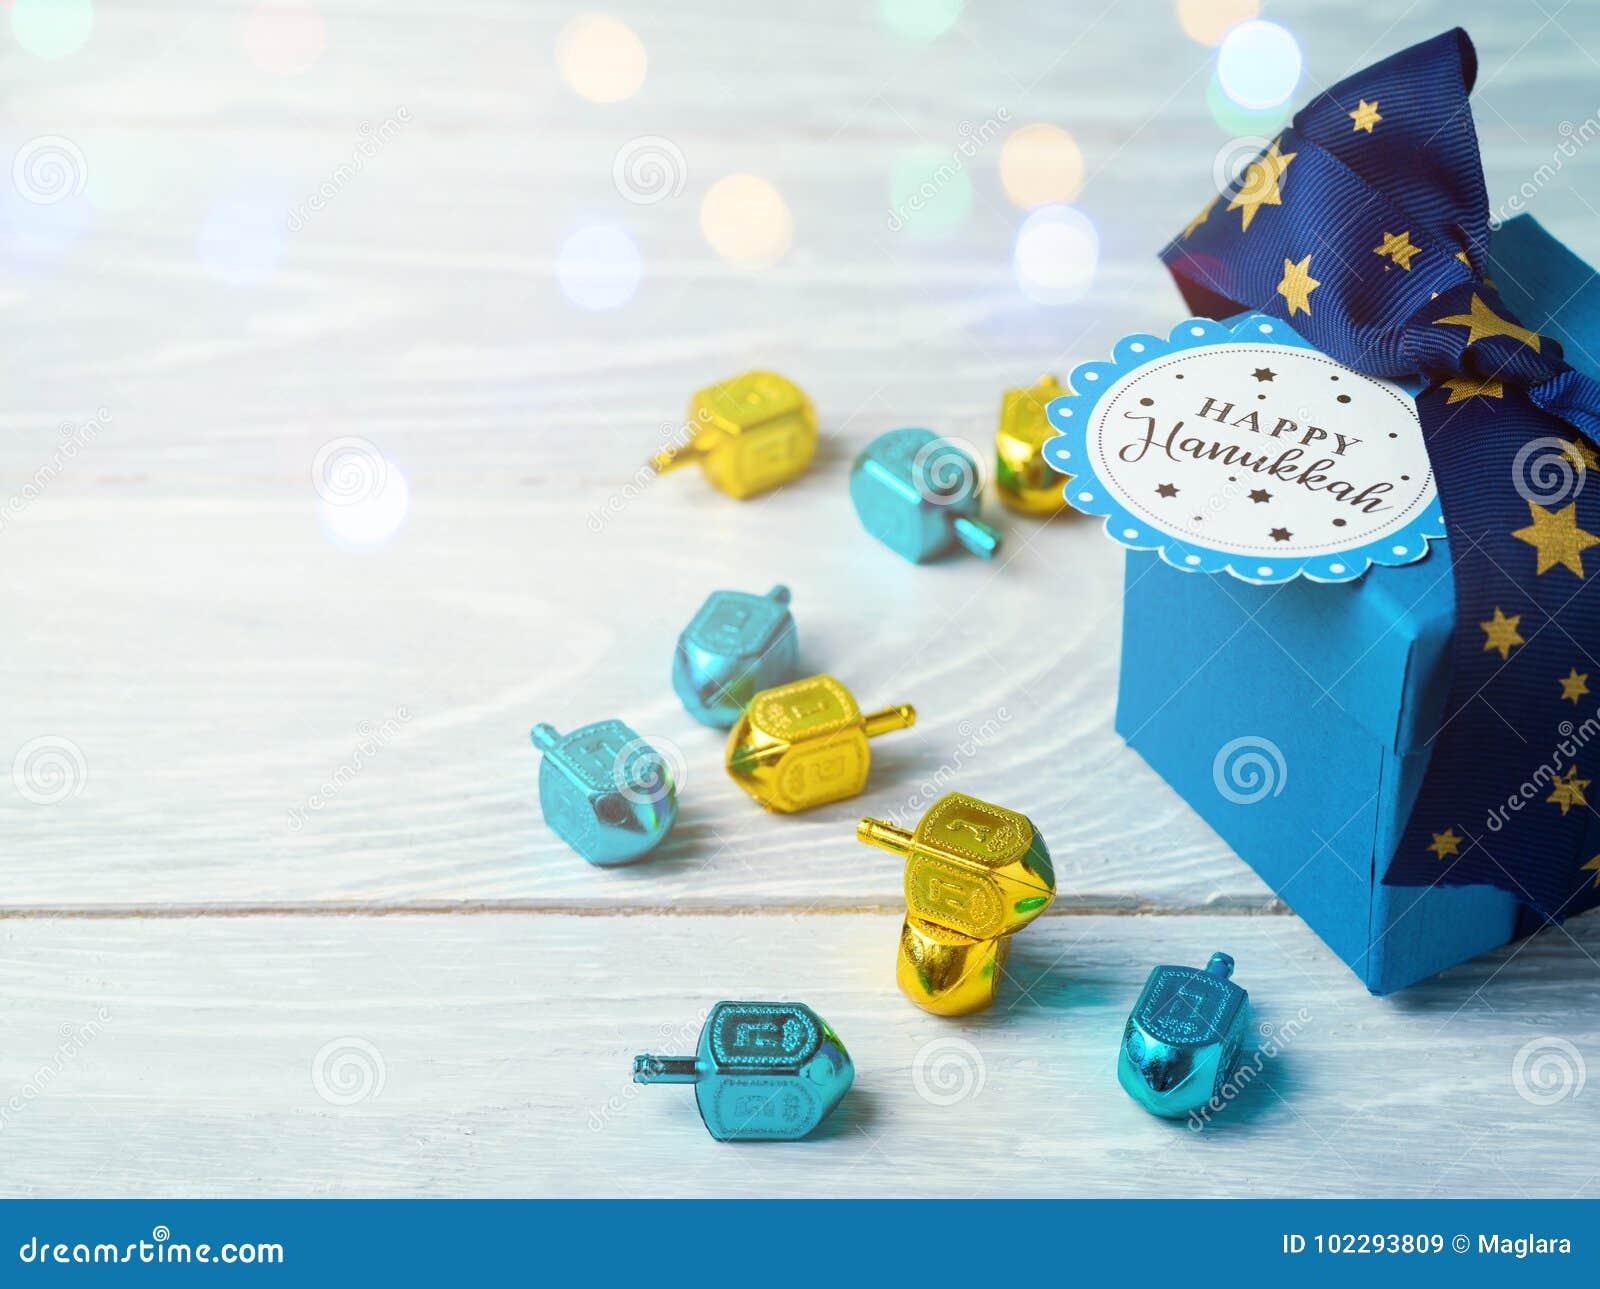 Hanukkah celebration with gift box